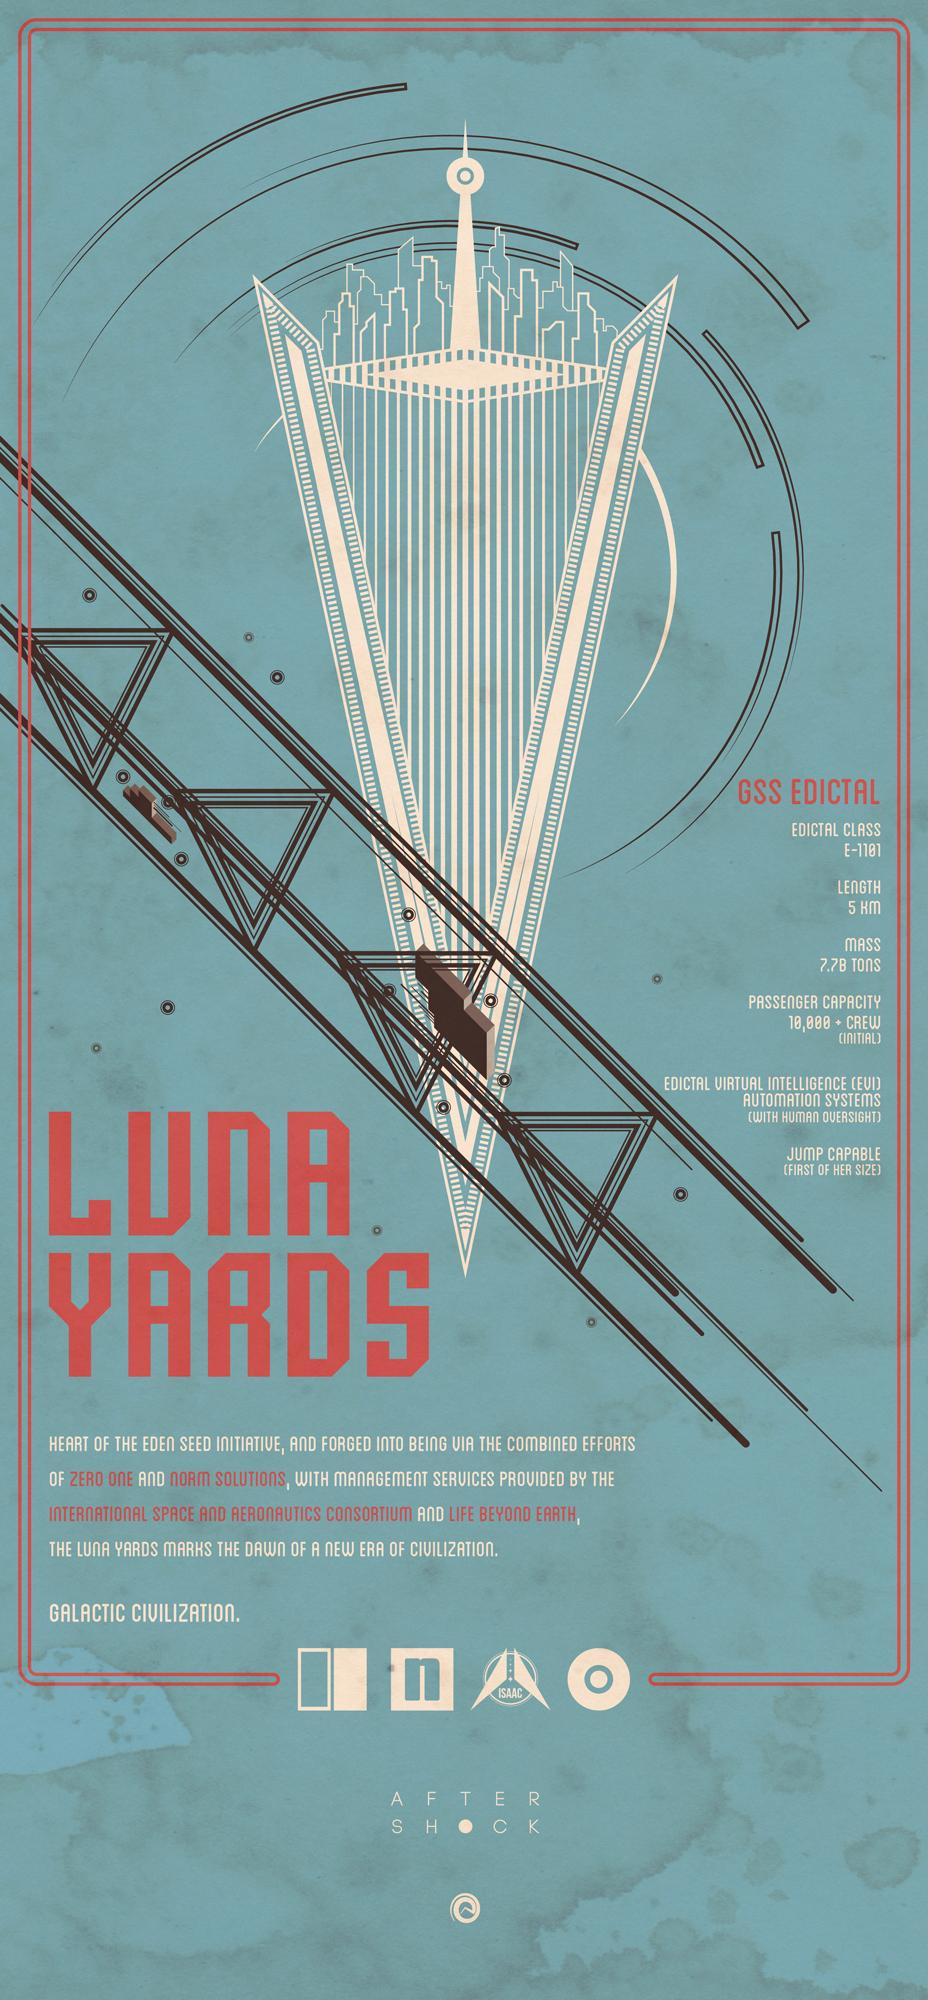 LUNA-YARDS-5BIG-S.png